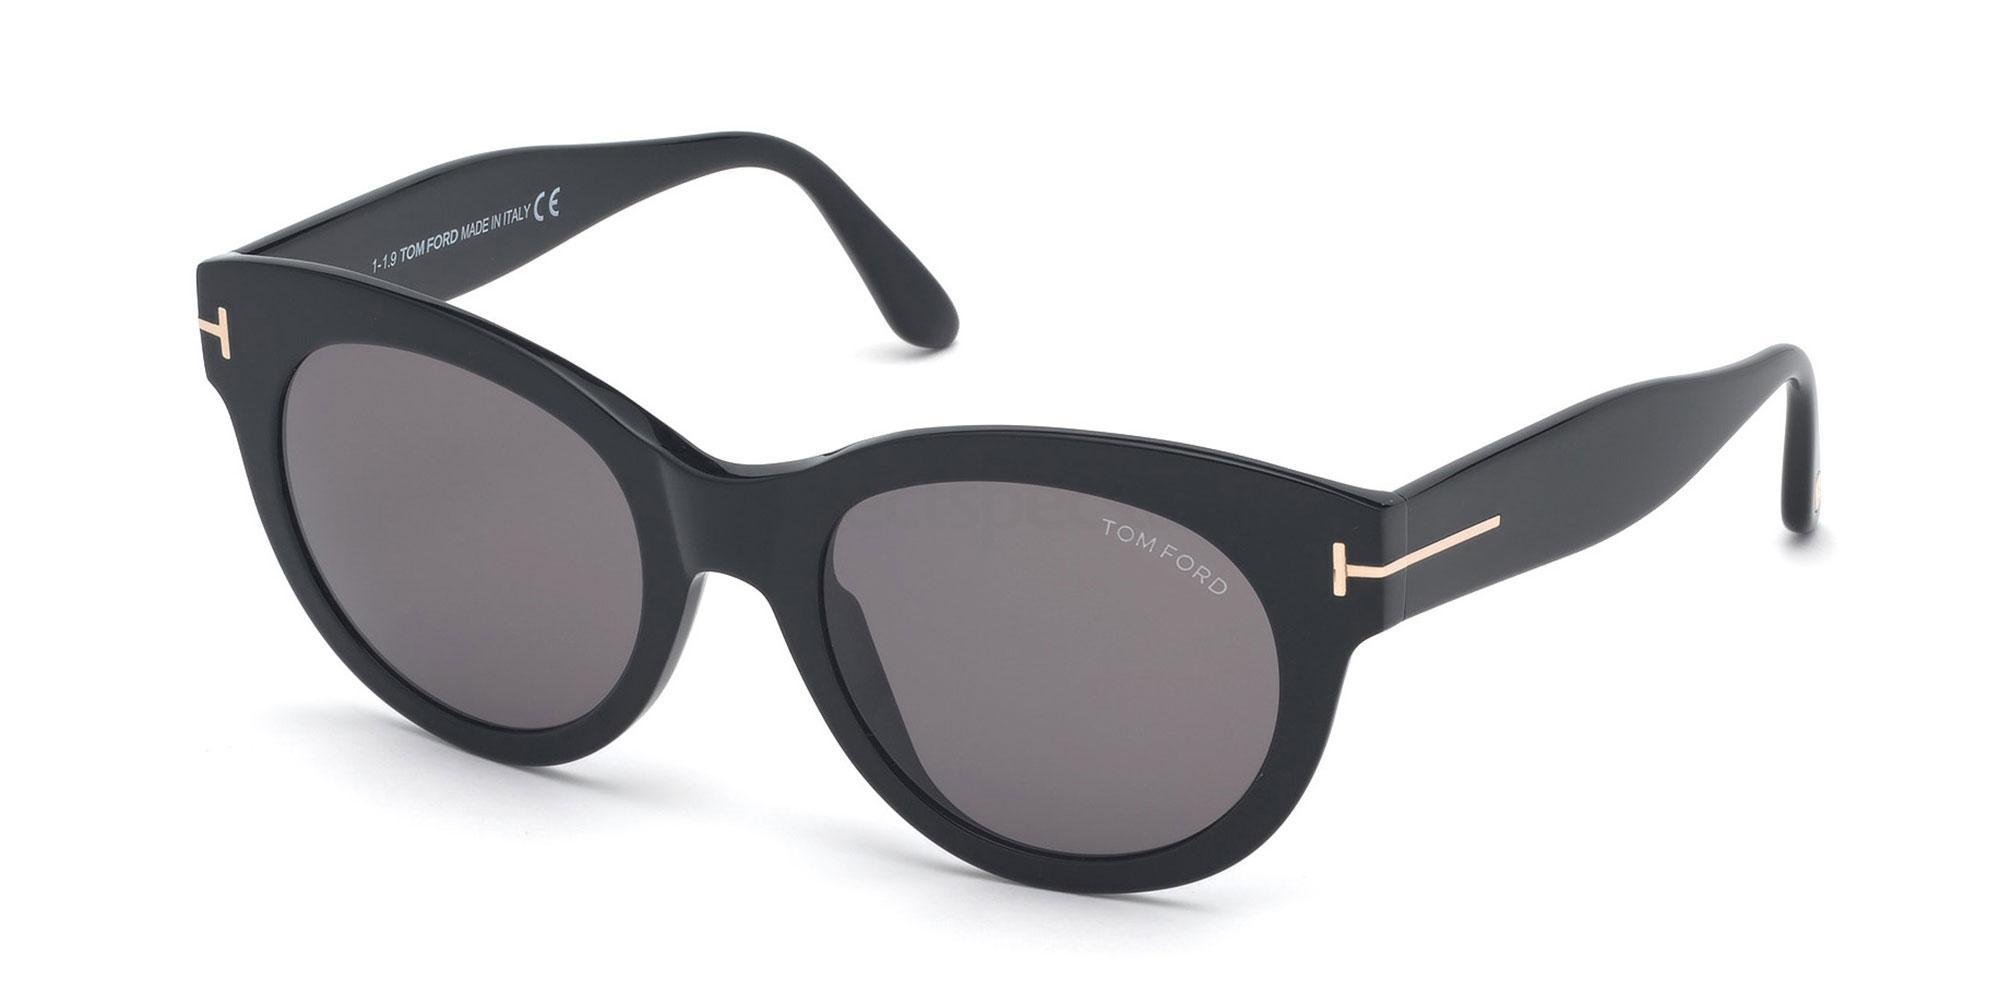 01A FT0741 Sunglasses, Tom Ford